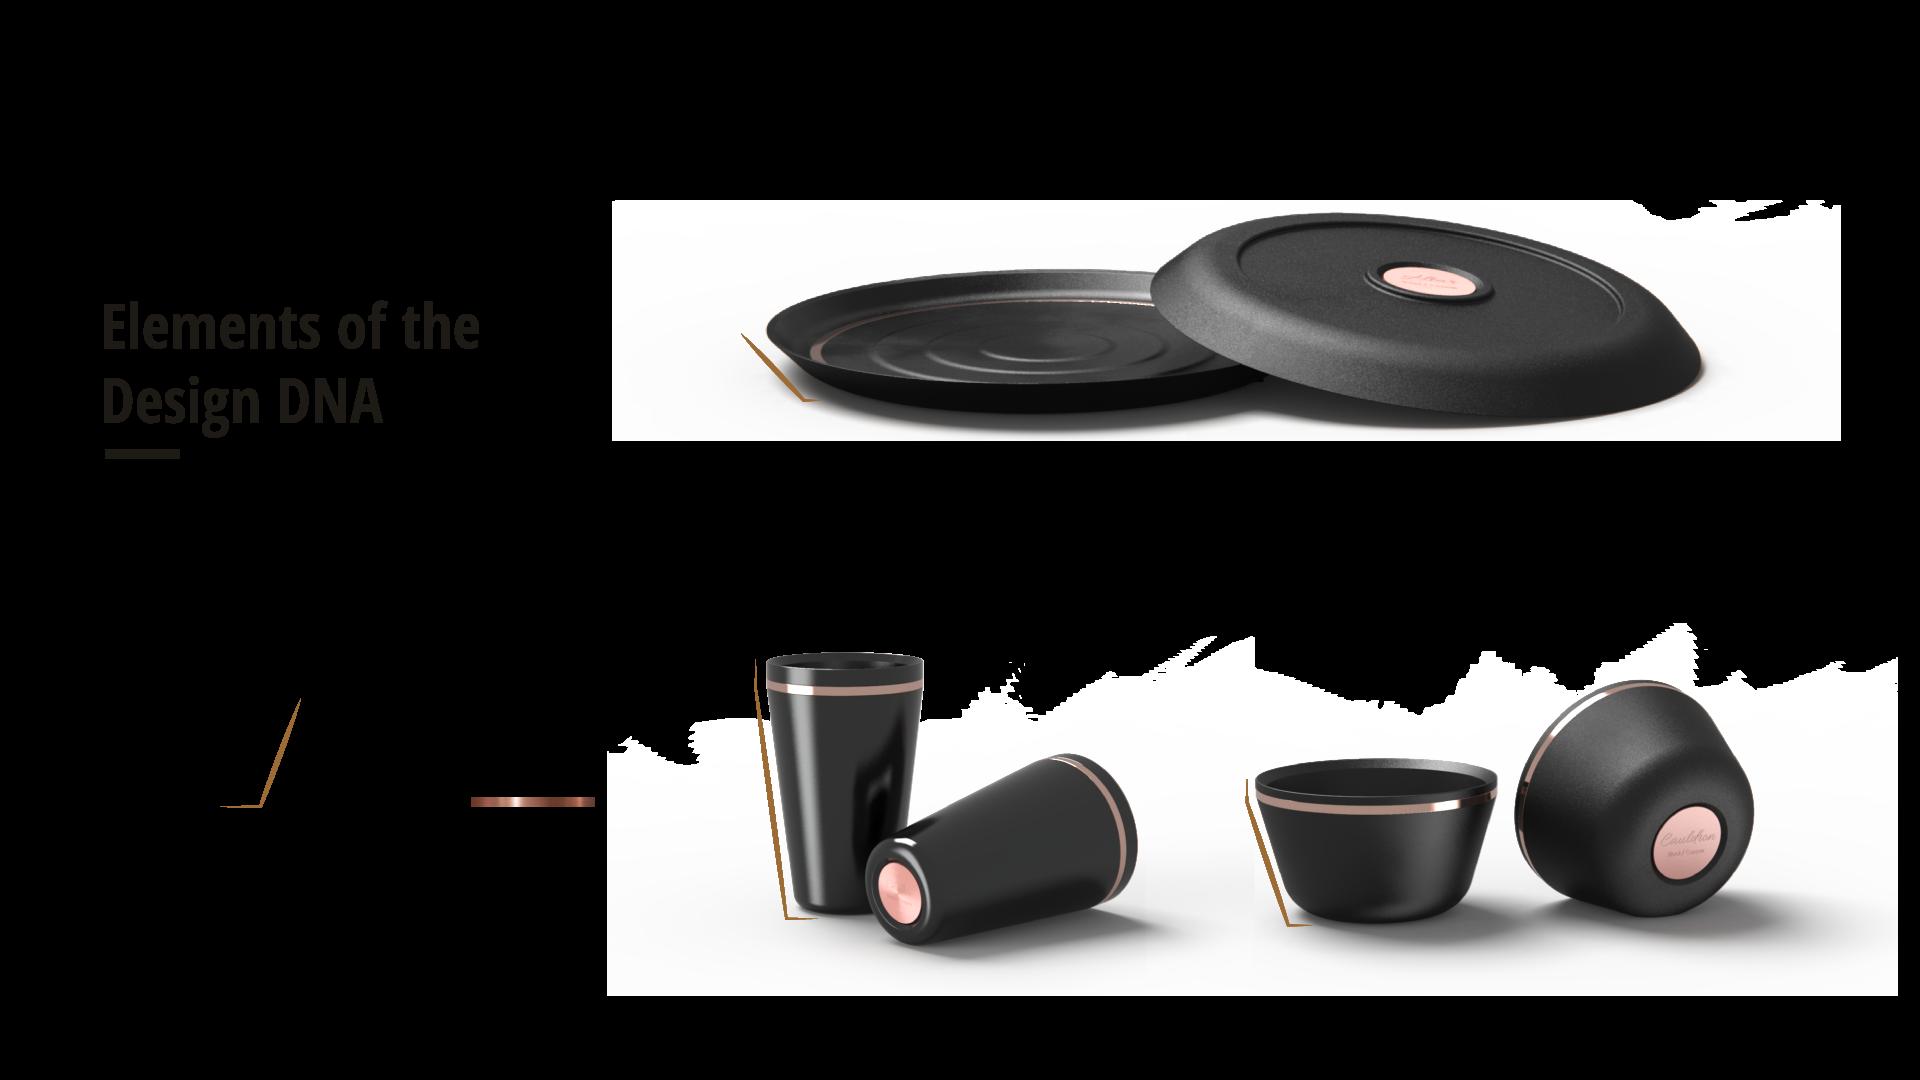 DinnerwareSet_DesignDNA